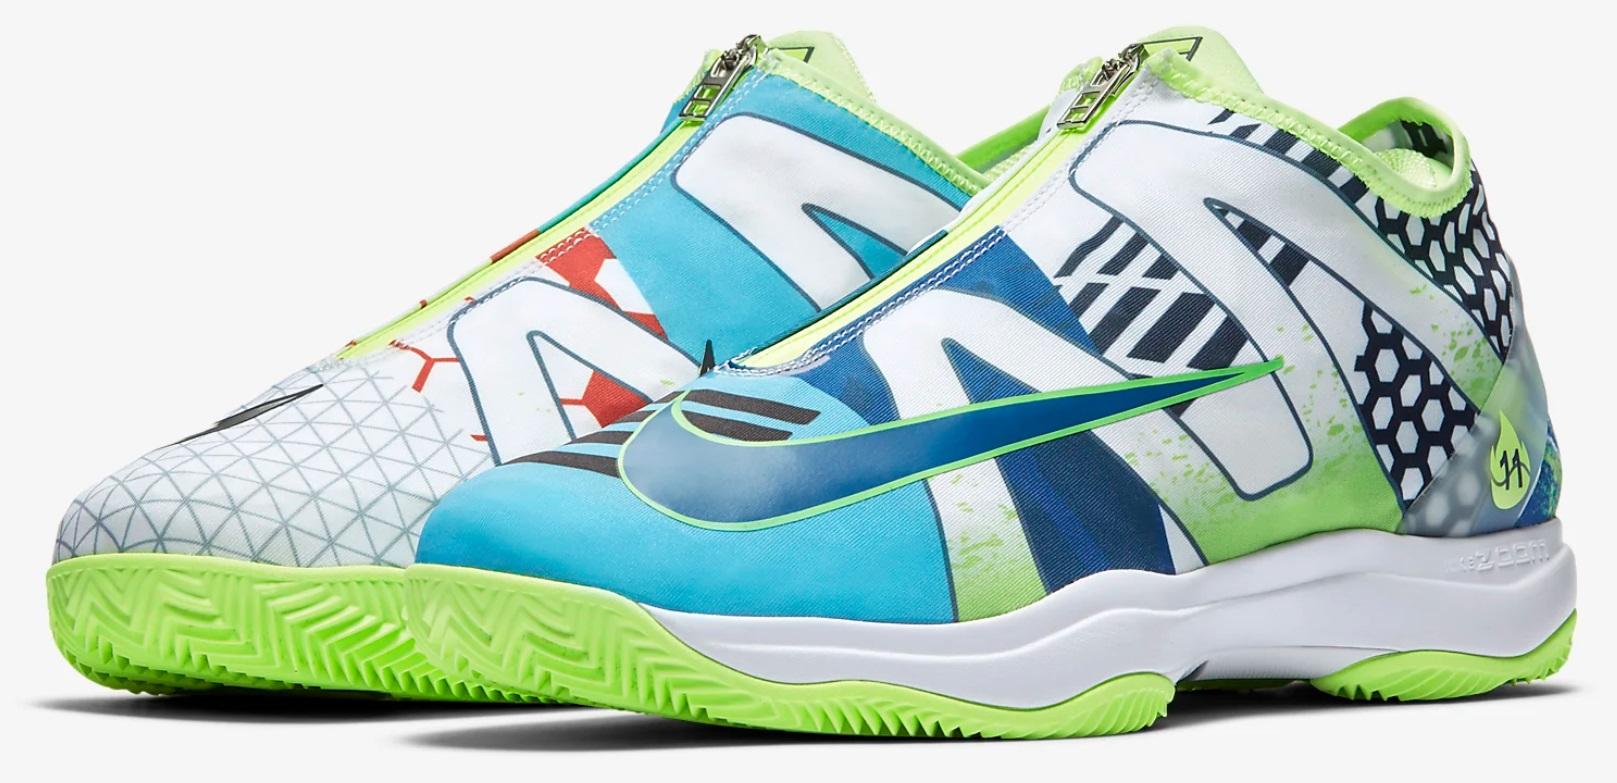 chaussure tennis nadal